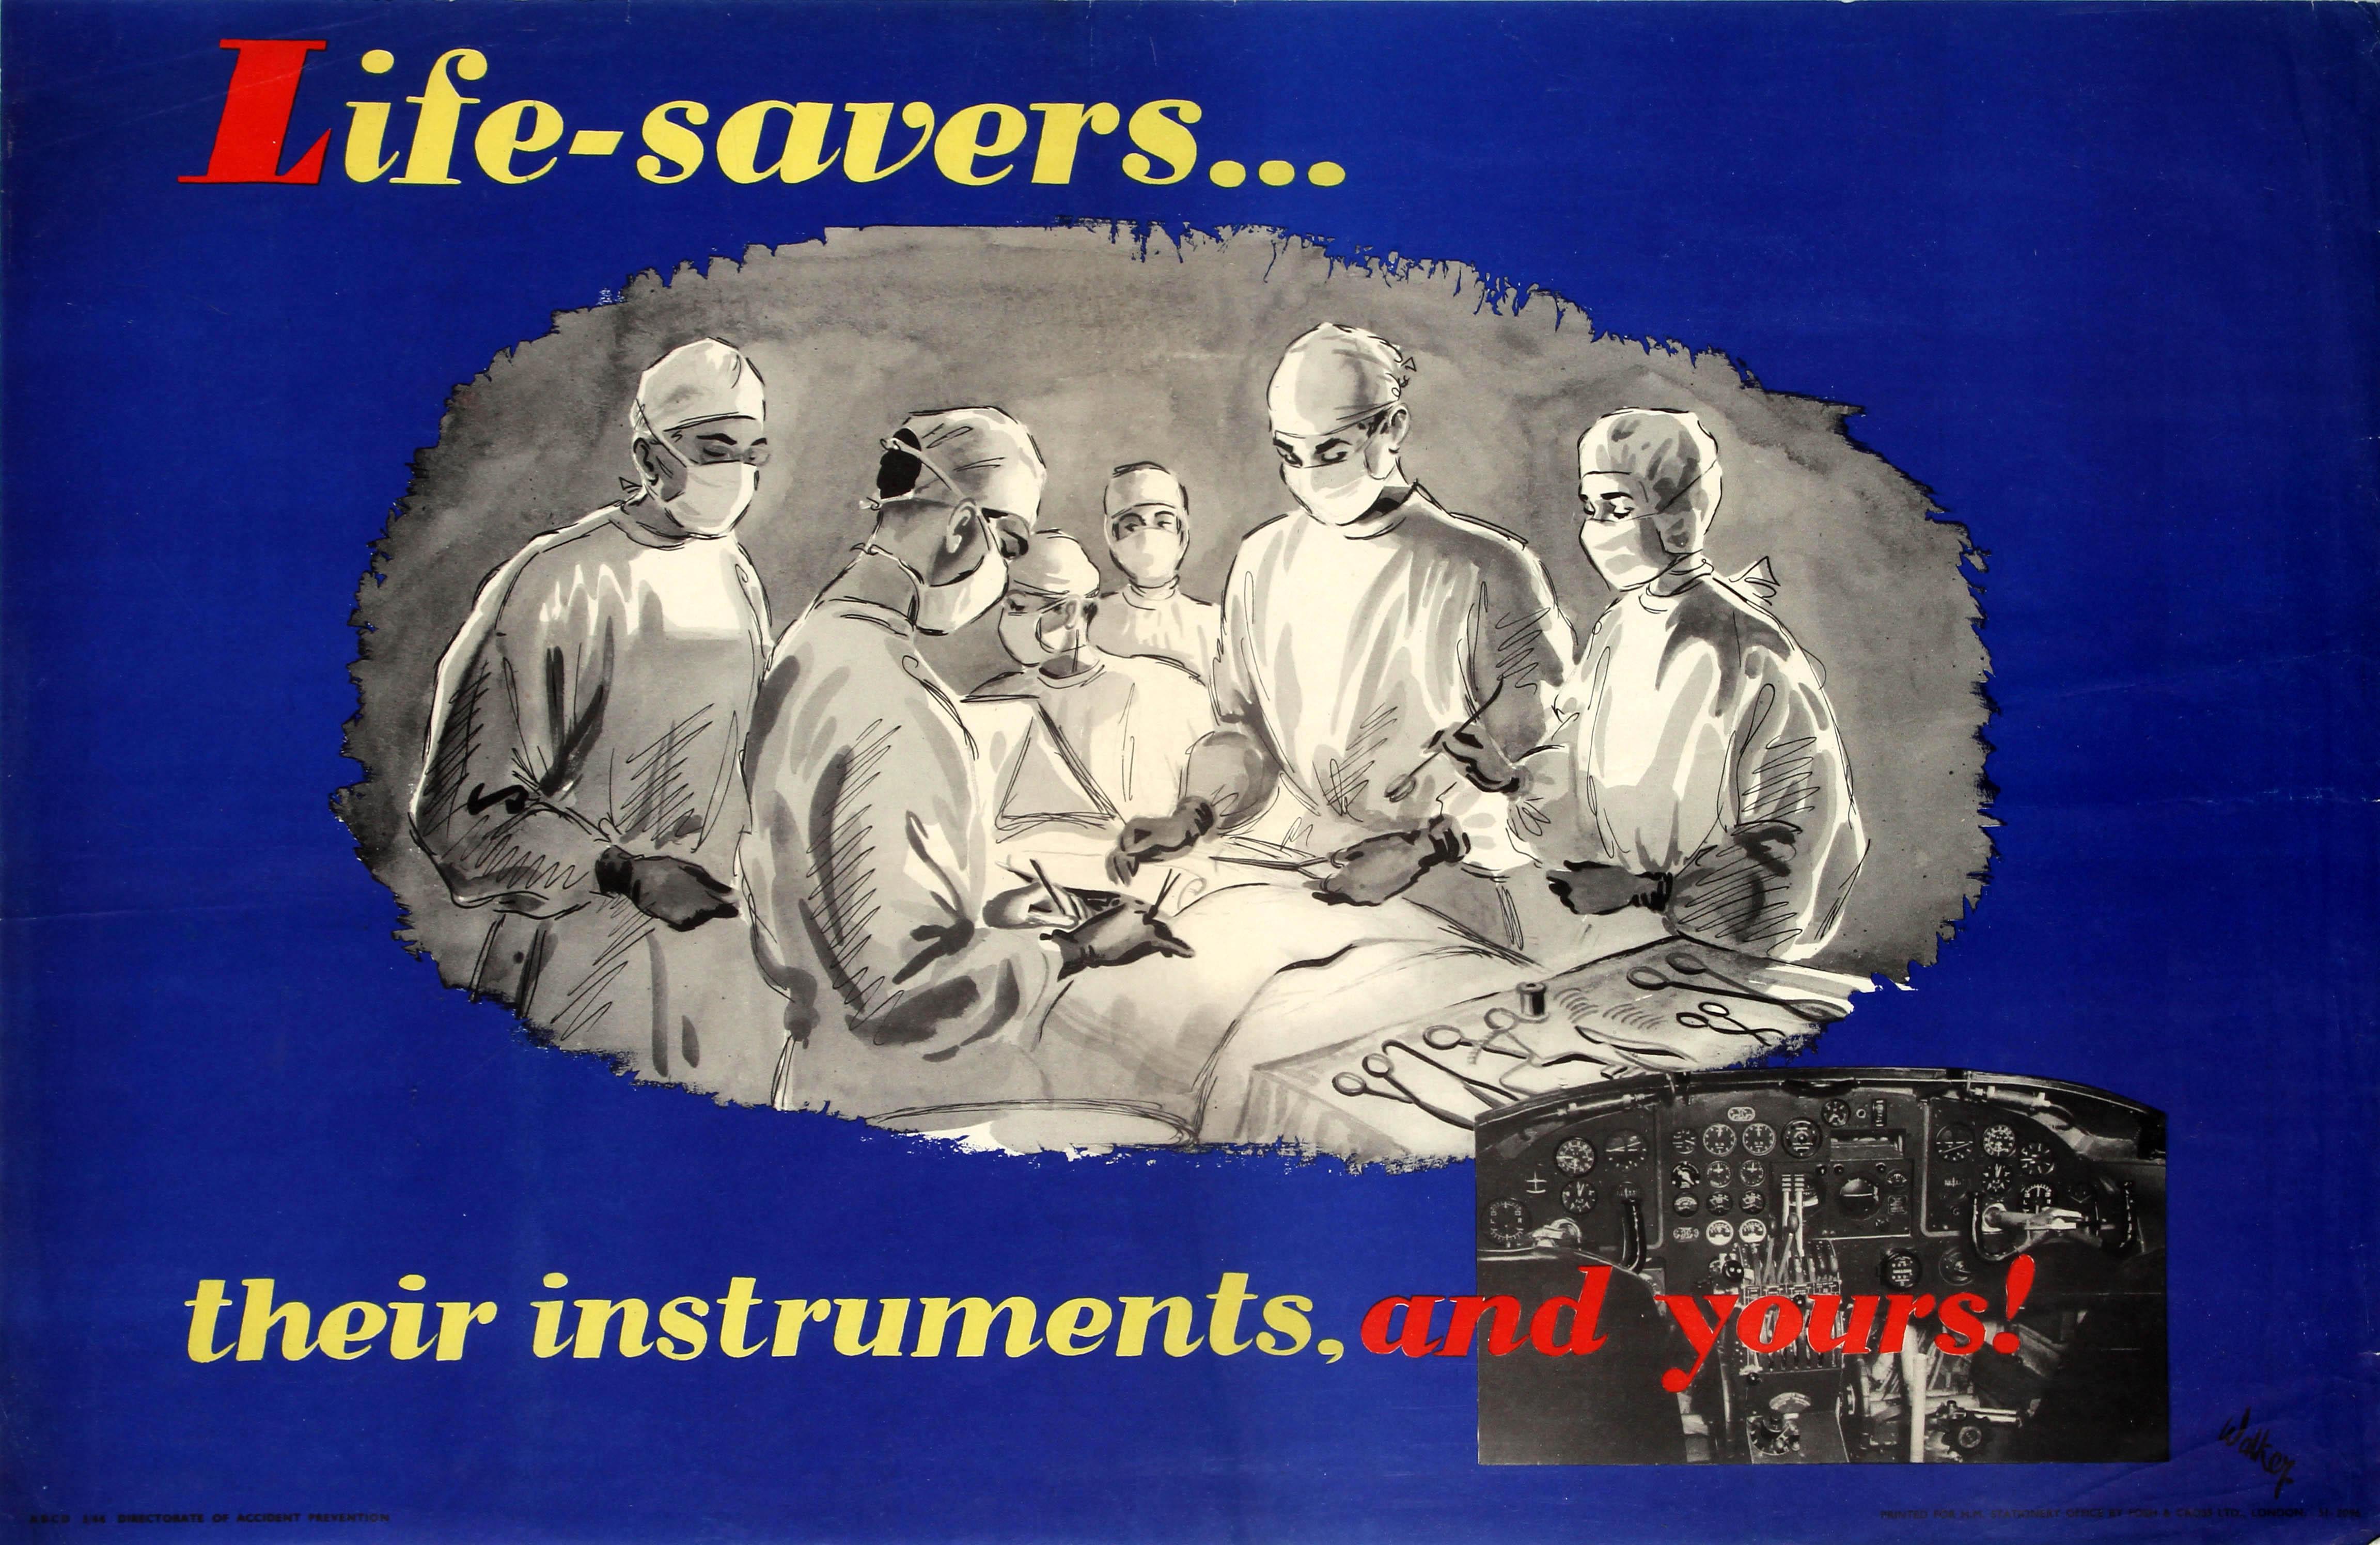 Lot 35 - Propaganda Poster Air Force Pilot Safety Life Savers Doctor Surgeon